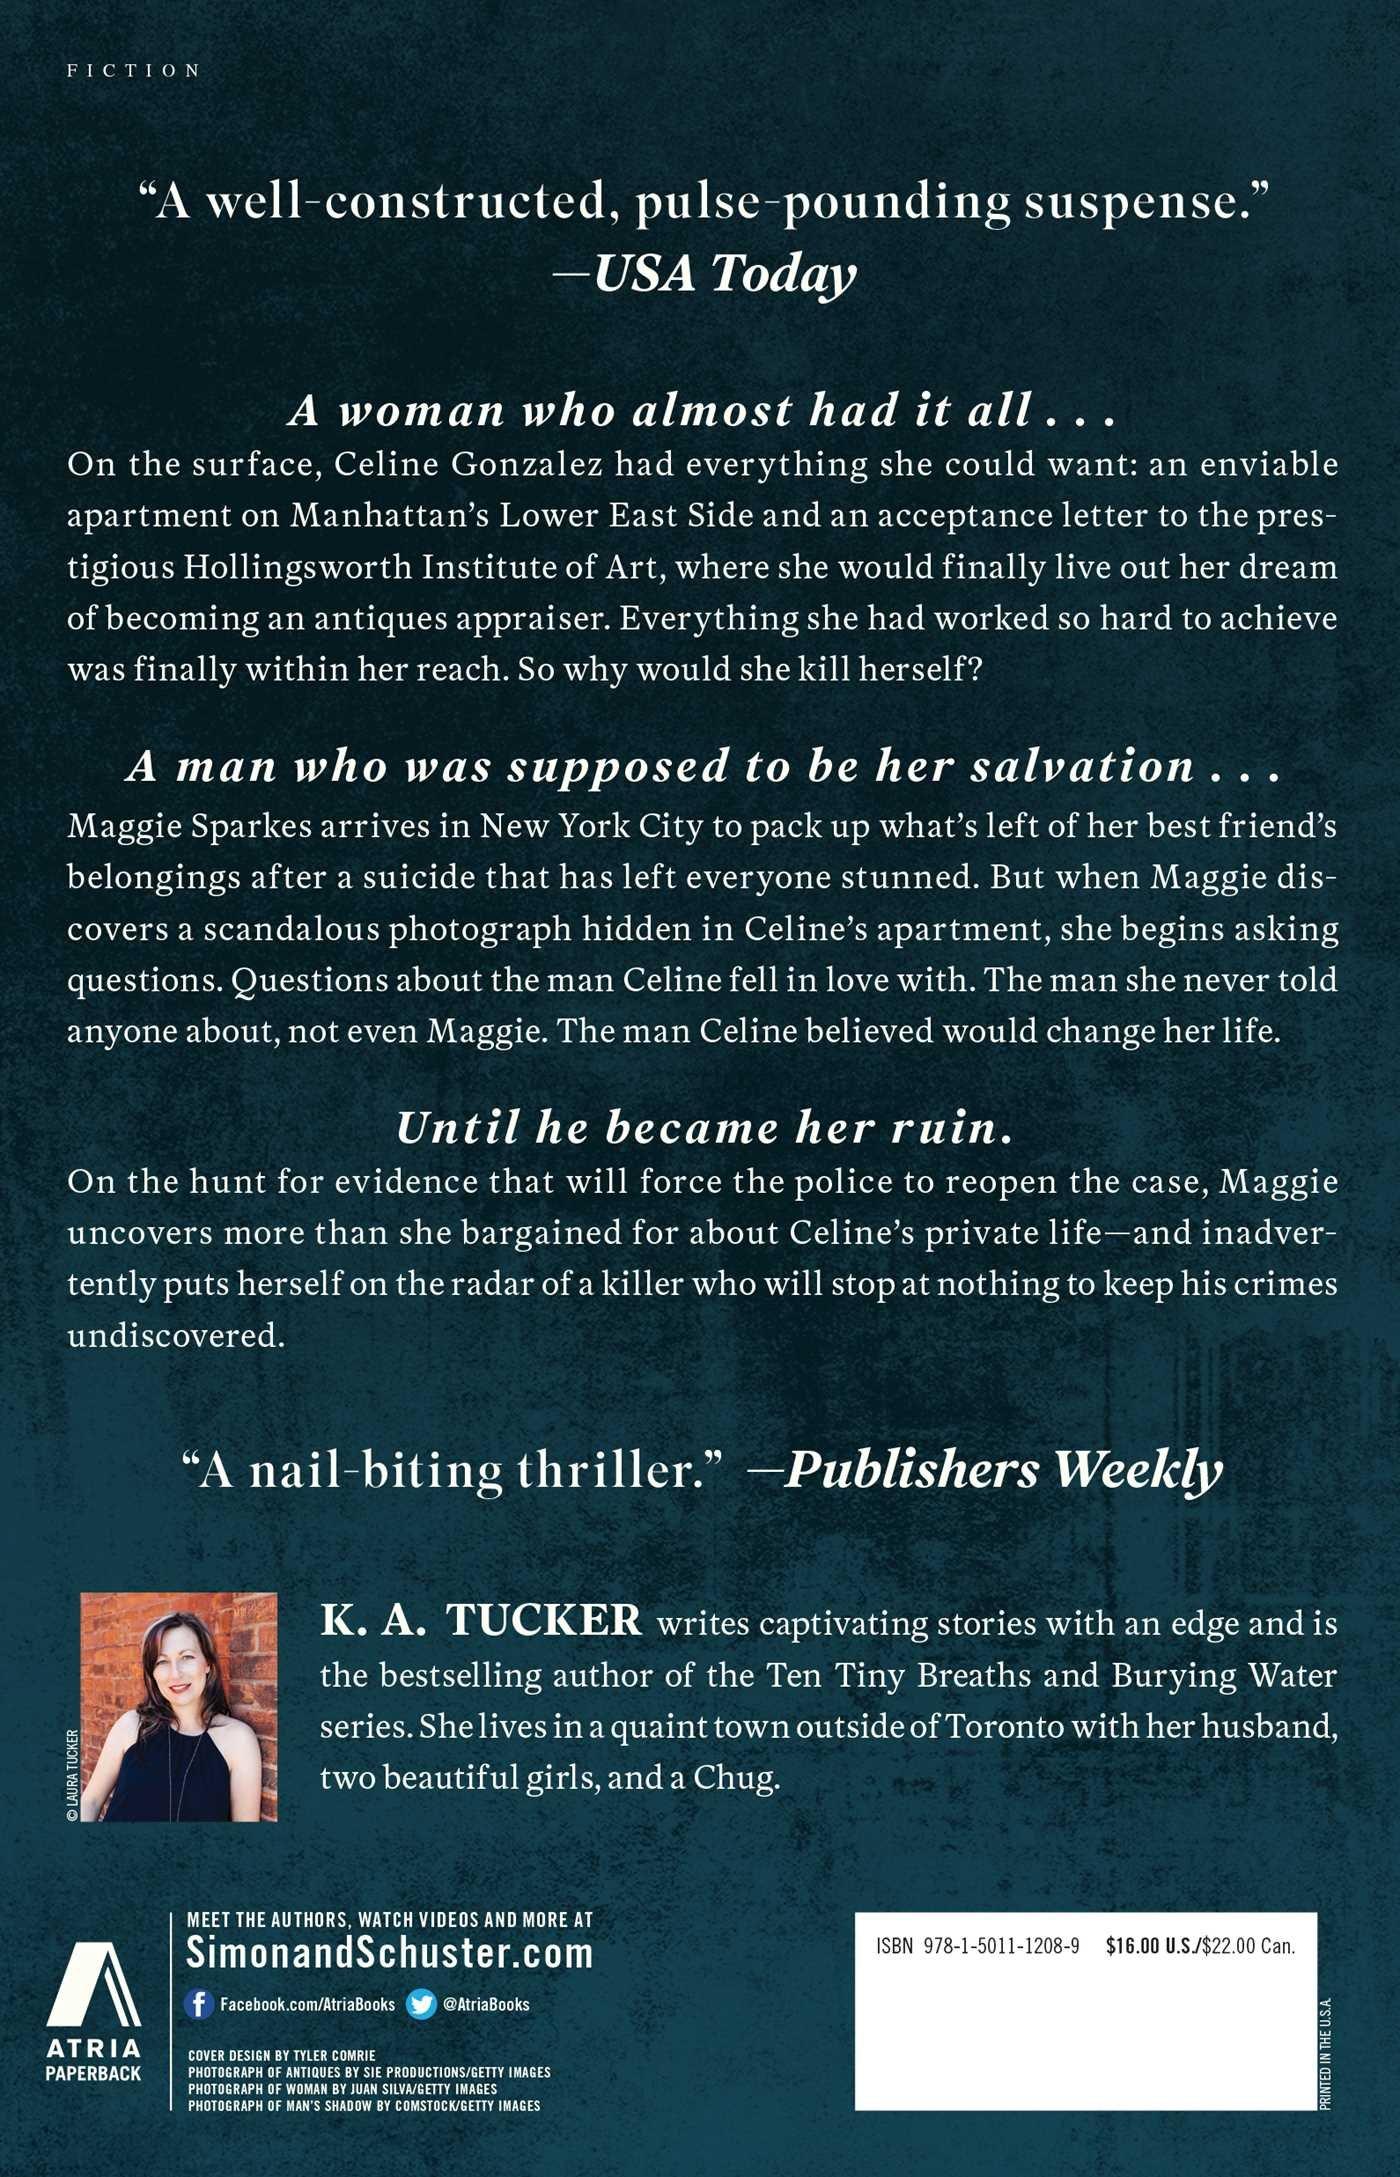 He Will Be My Ruin: A Novel: Amazon.de: K.A. Tucker ...